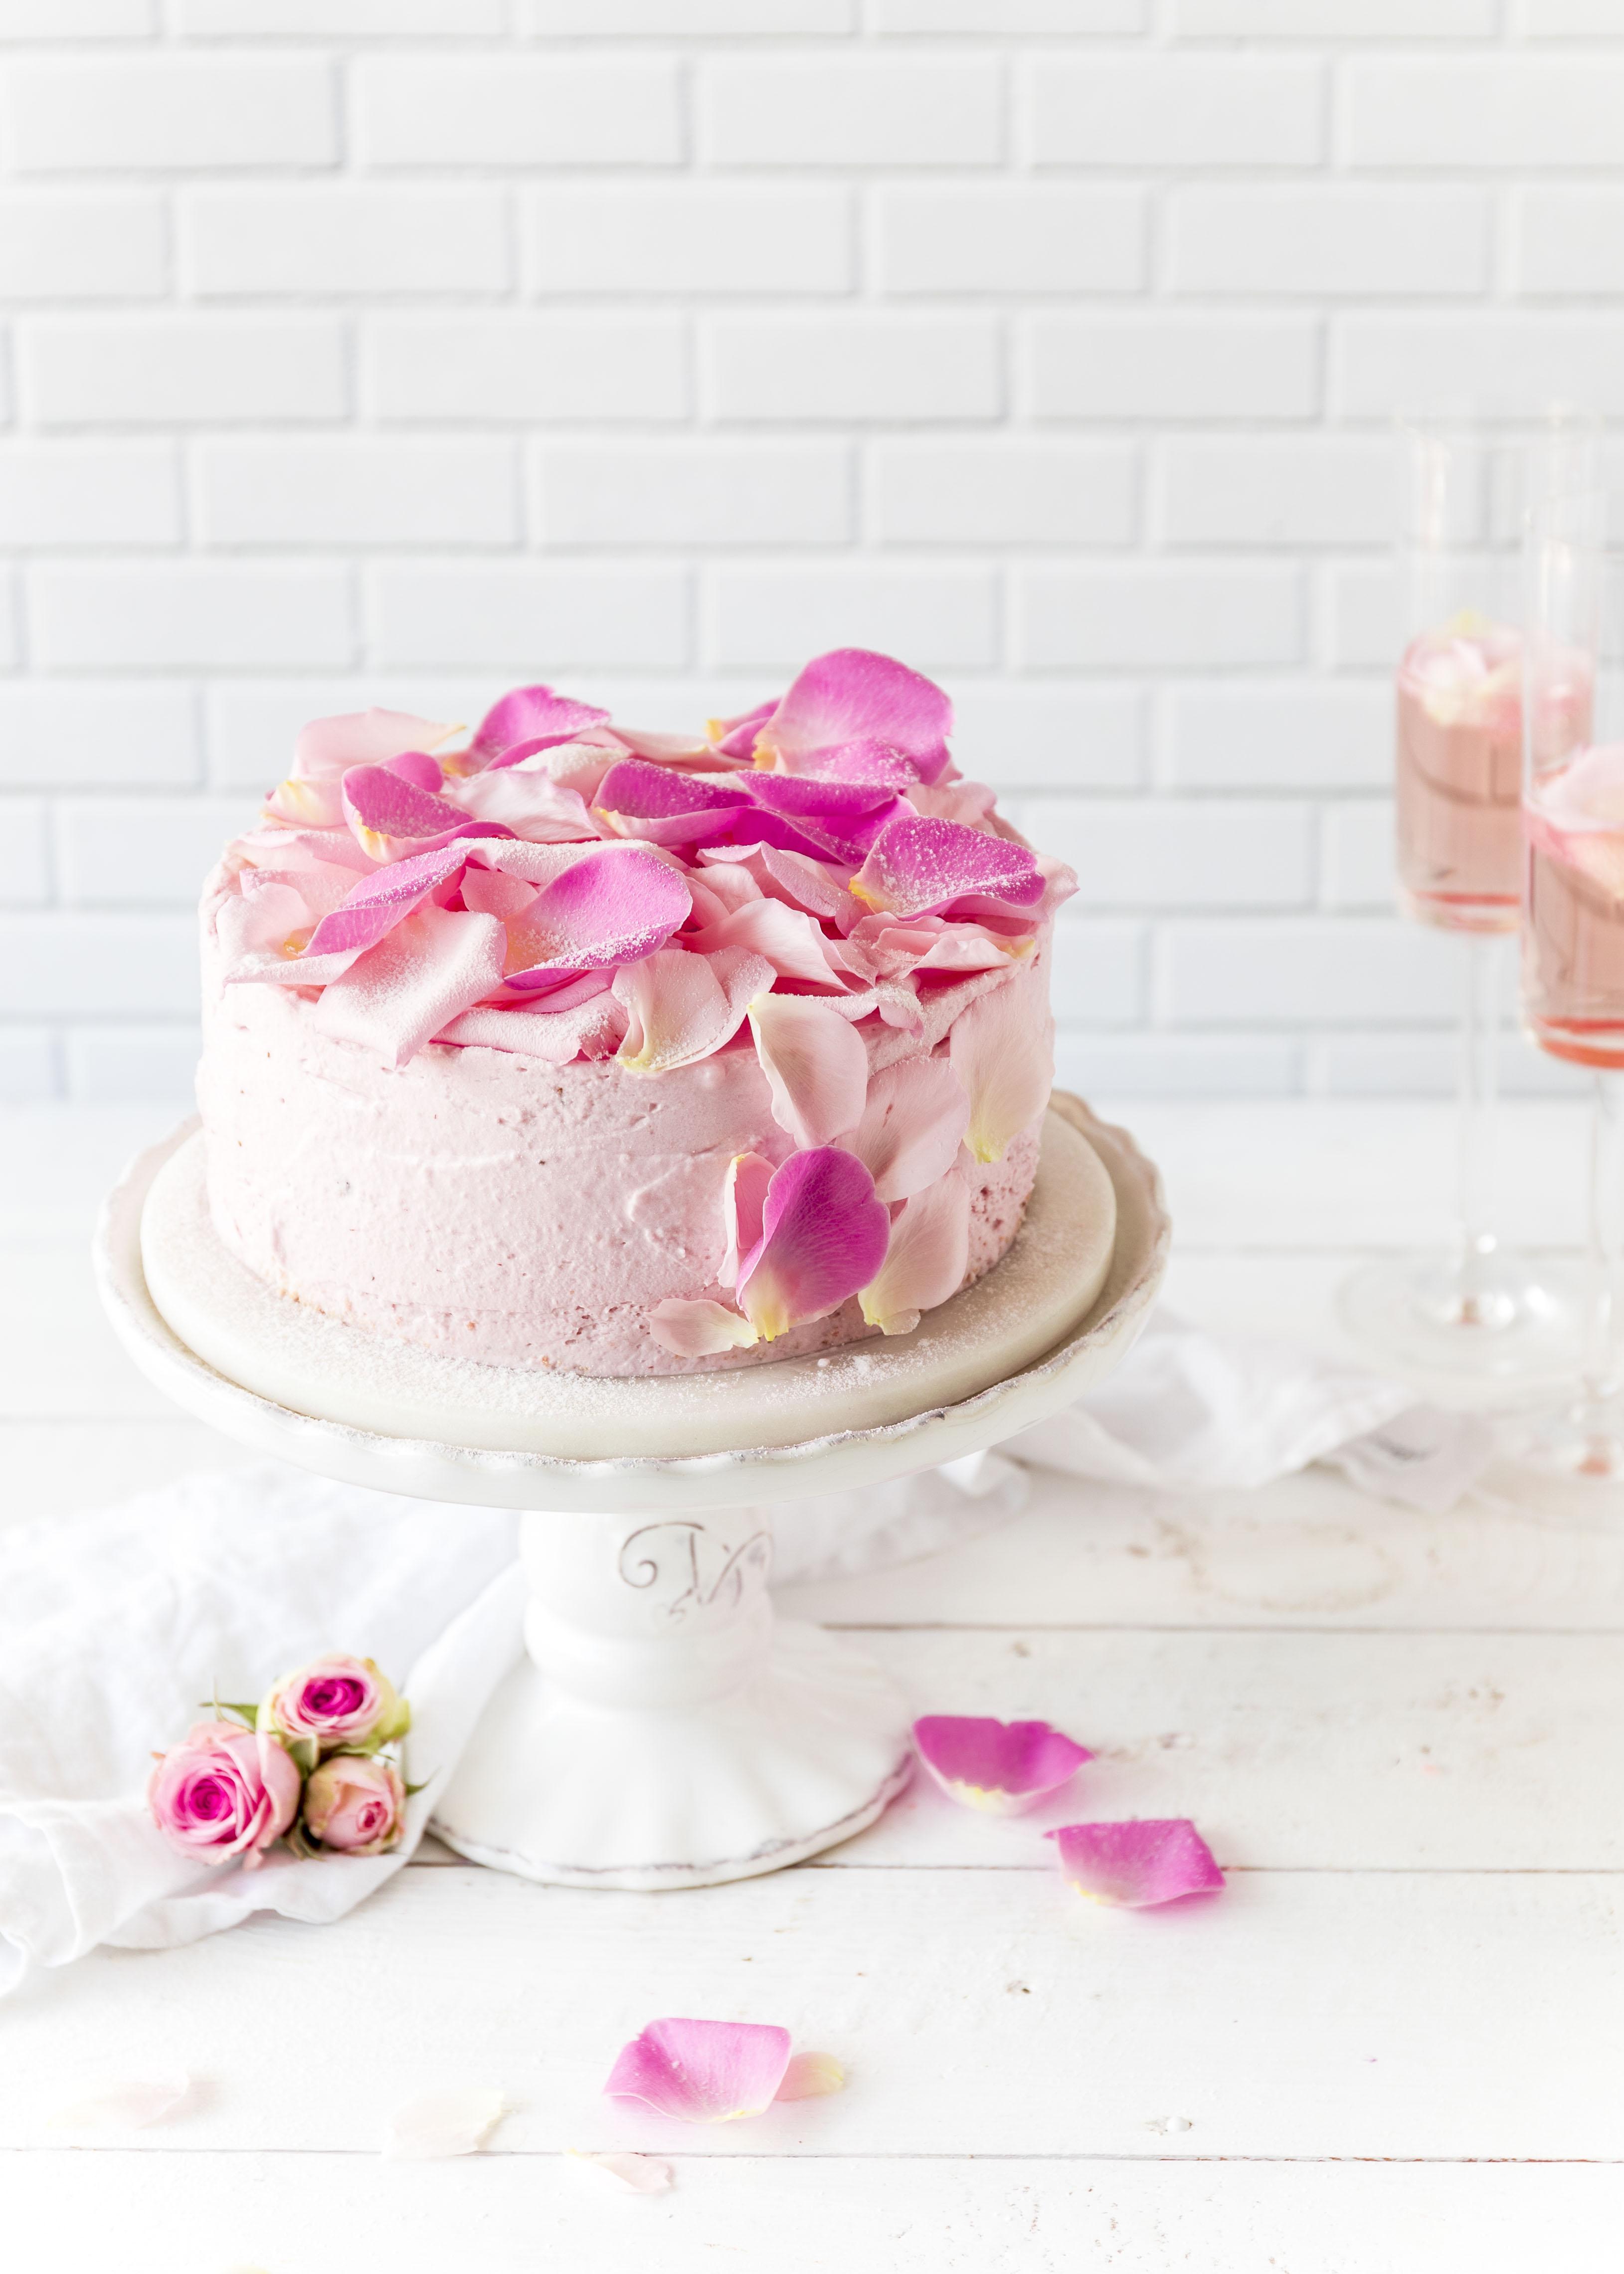 Rezept: Erdbeer Sekt Torte zum Muttertag mit Rosenblüten backen #muttertag #sekt #torte #mothersday #backen #erdbeeren #cake fluffiger Biskuit | Emma´s Lieblingsstücke